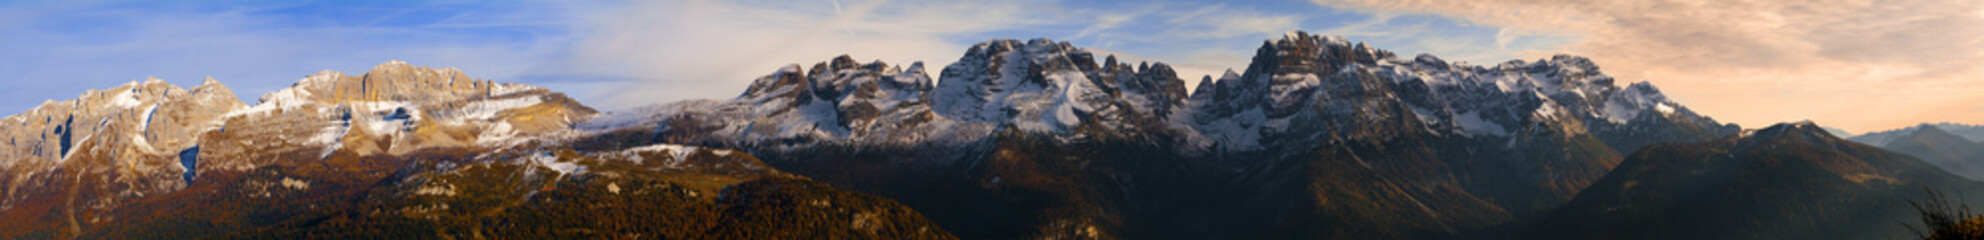 Panoramica Dolomiti di Brenta © Stegrim